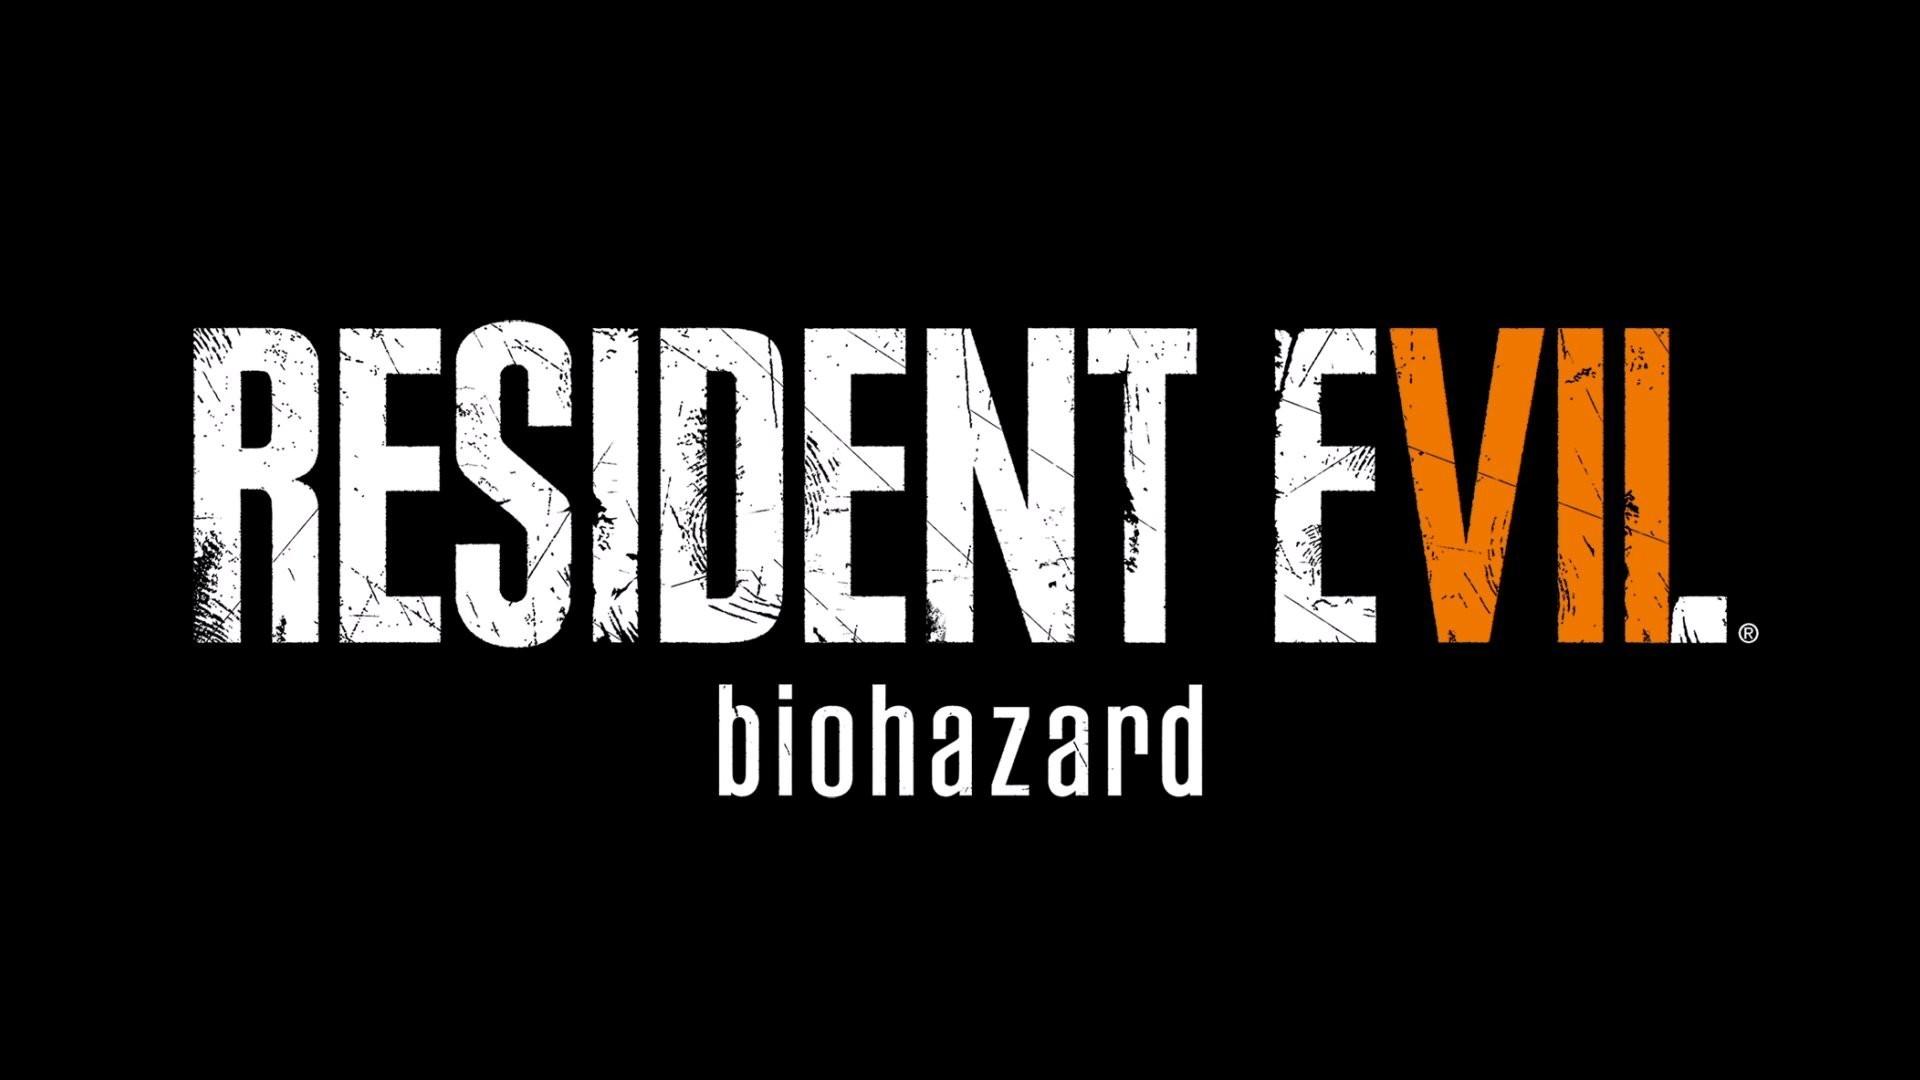 Превью. Resident evil 7